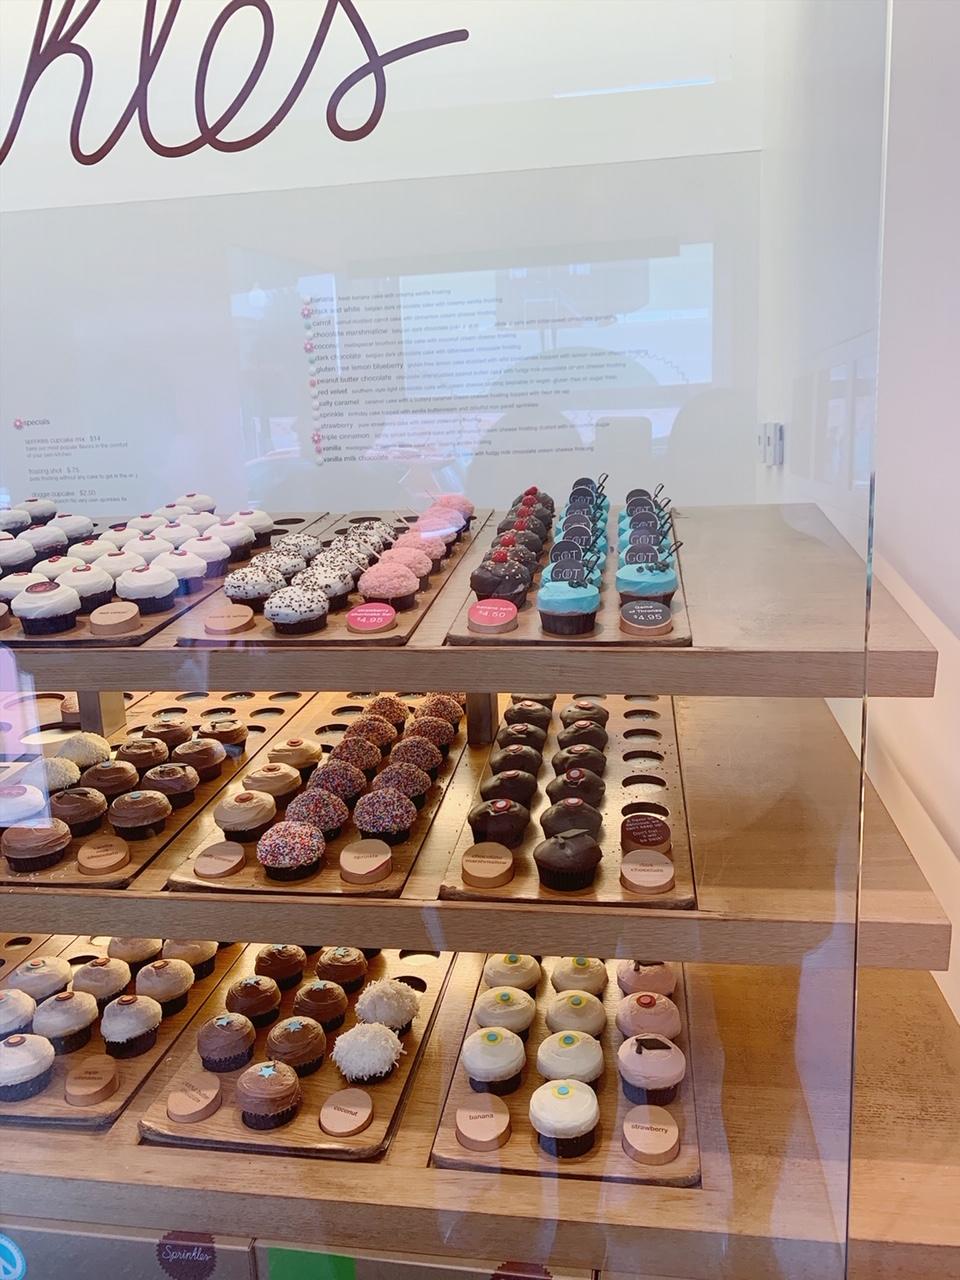 Sprinkles Cupcakes Game of Thrones